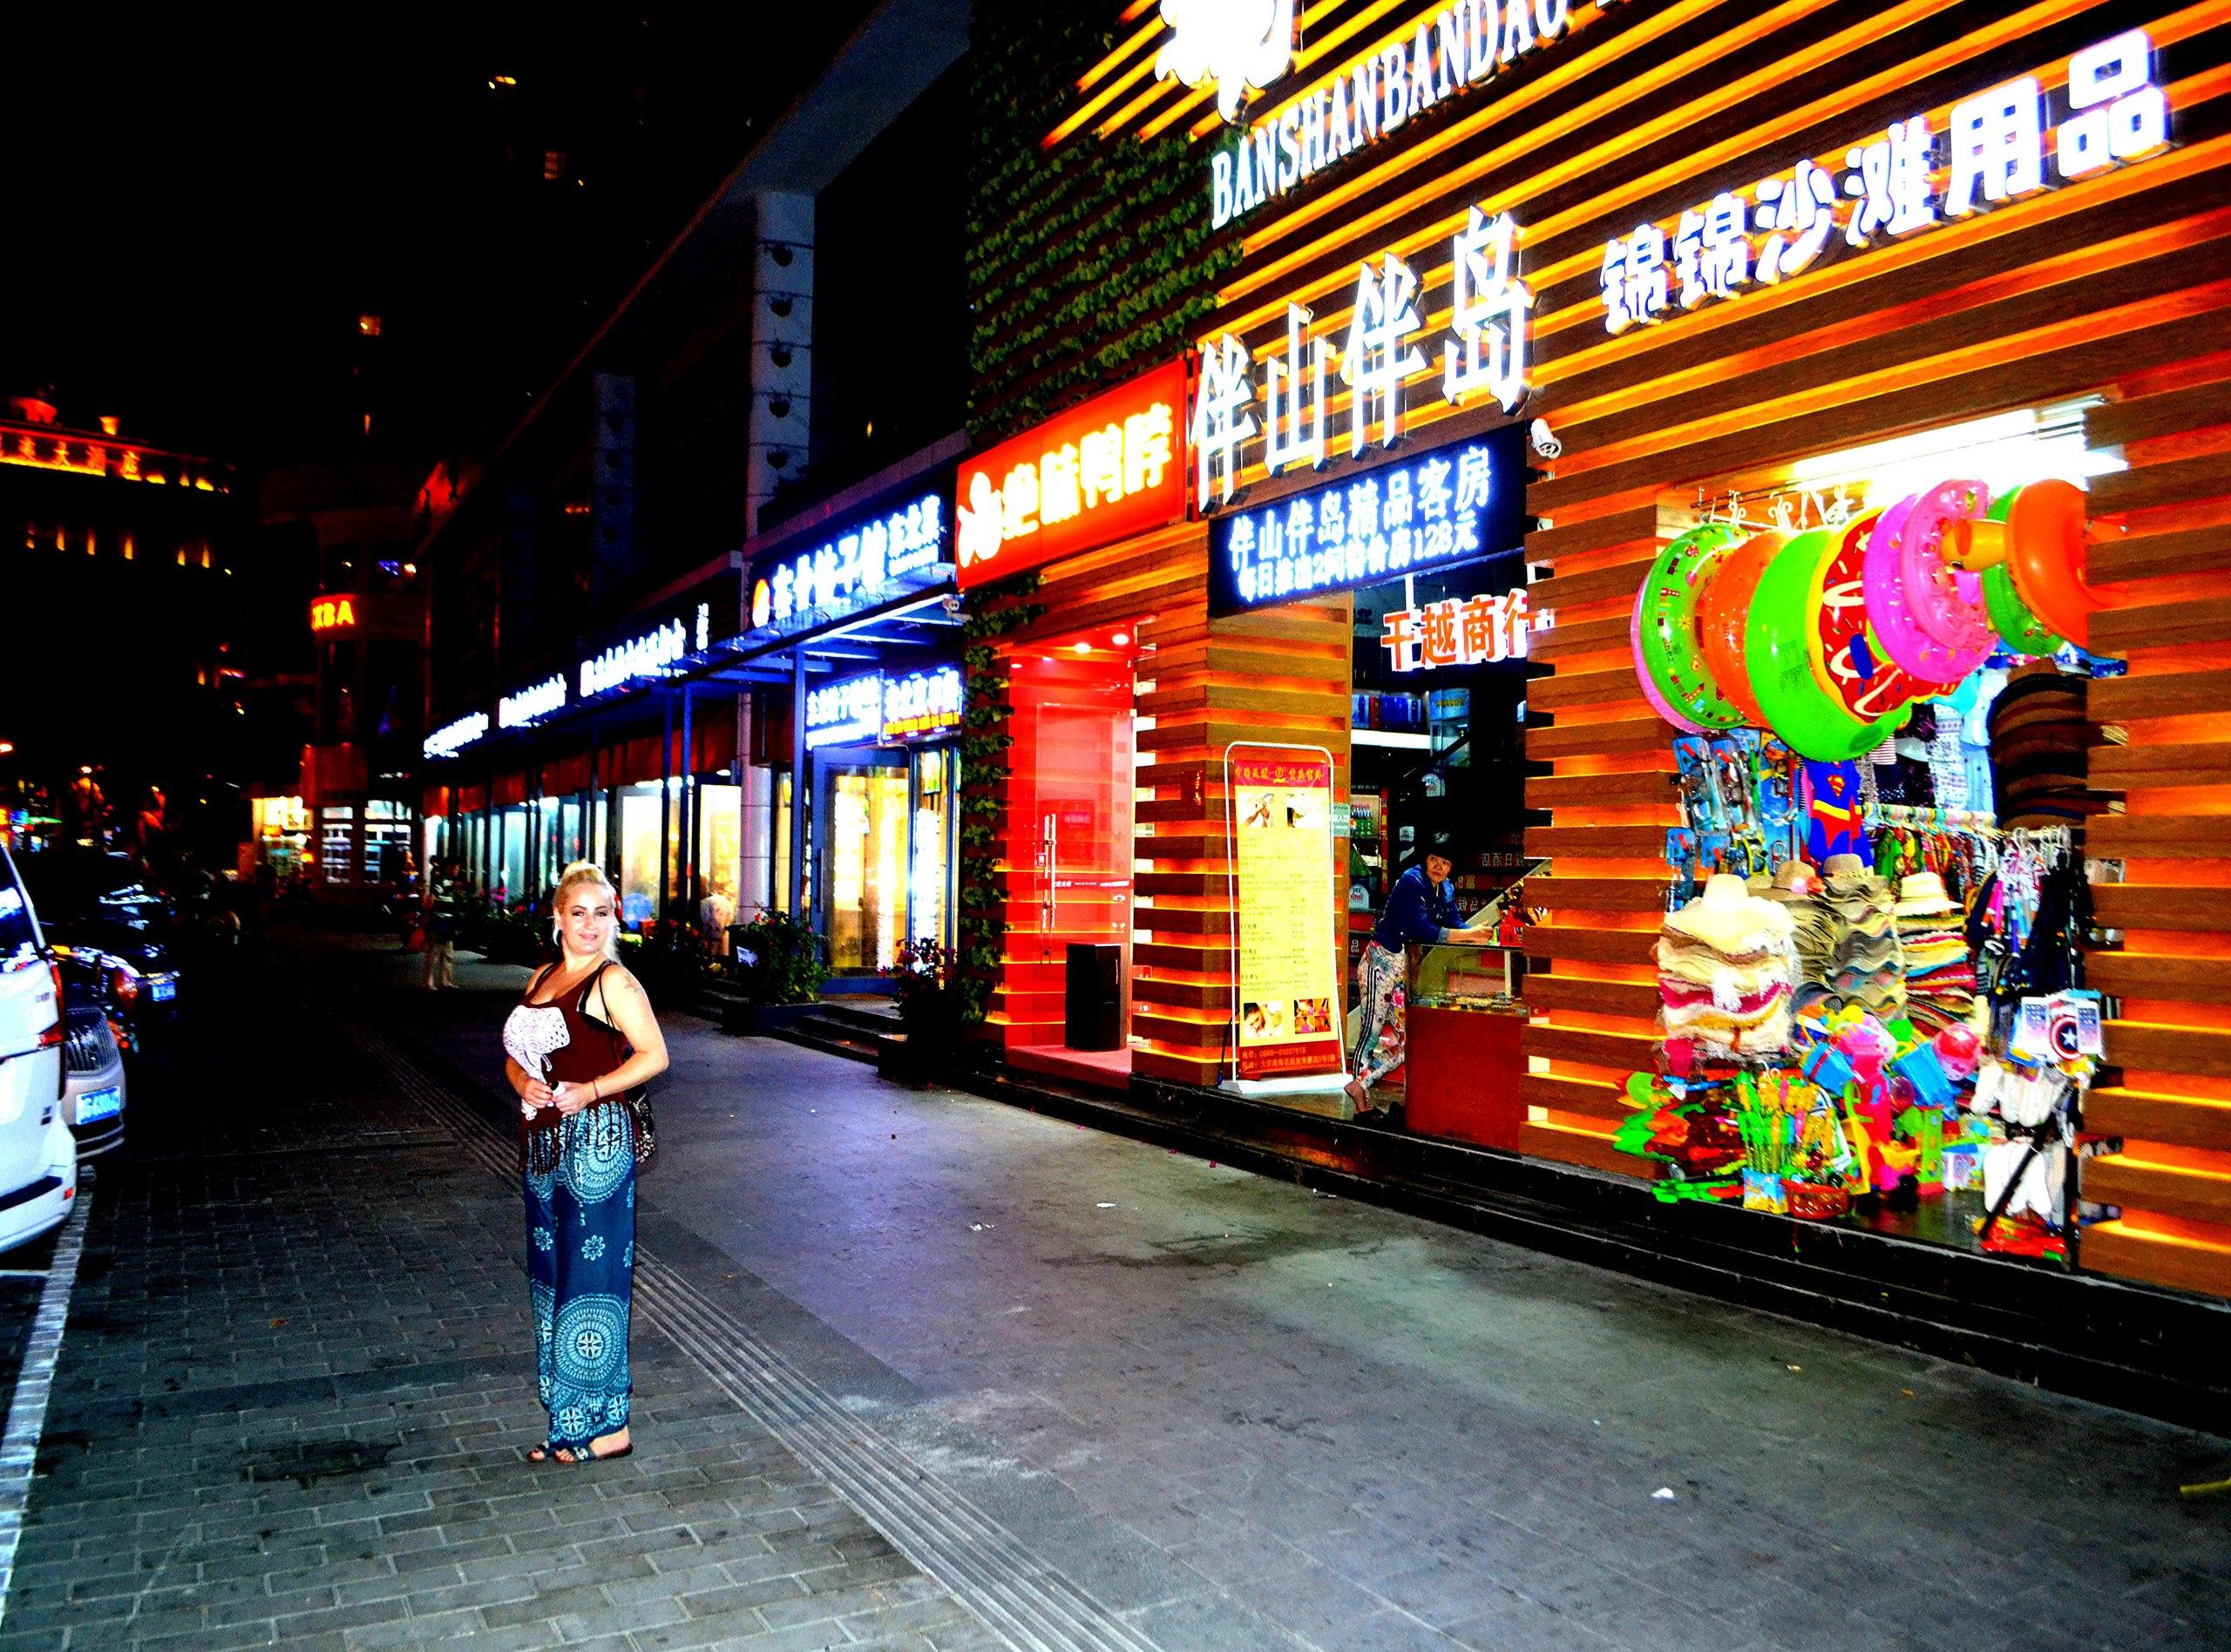 Елена Руденко (Валтея). Китай, о.Хайнань, г.Санья. (фото) - Страница 2 8qqE6v9OXo8